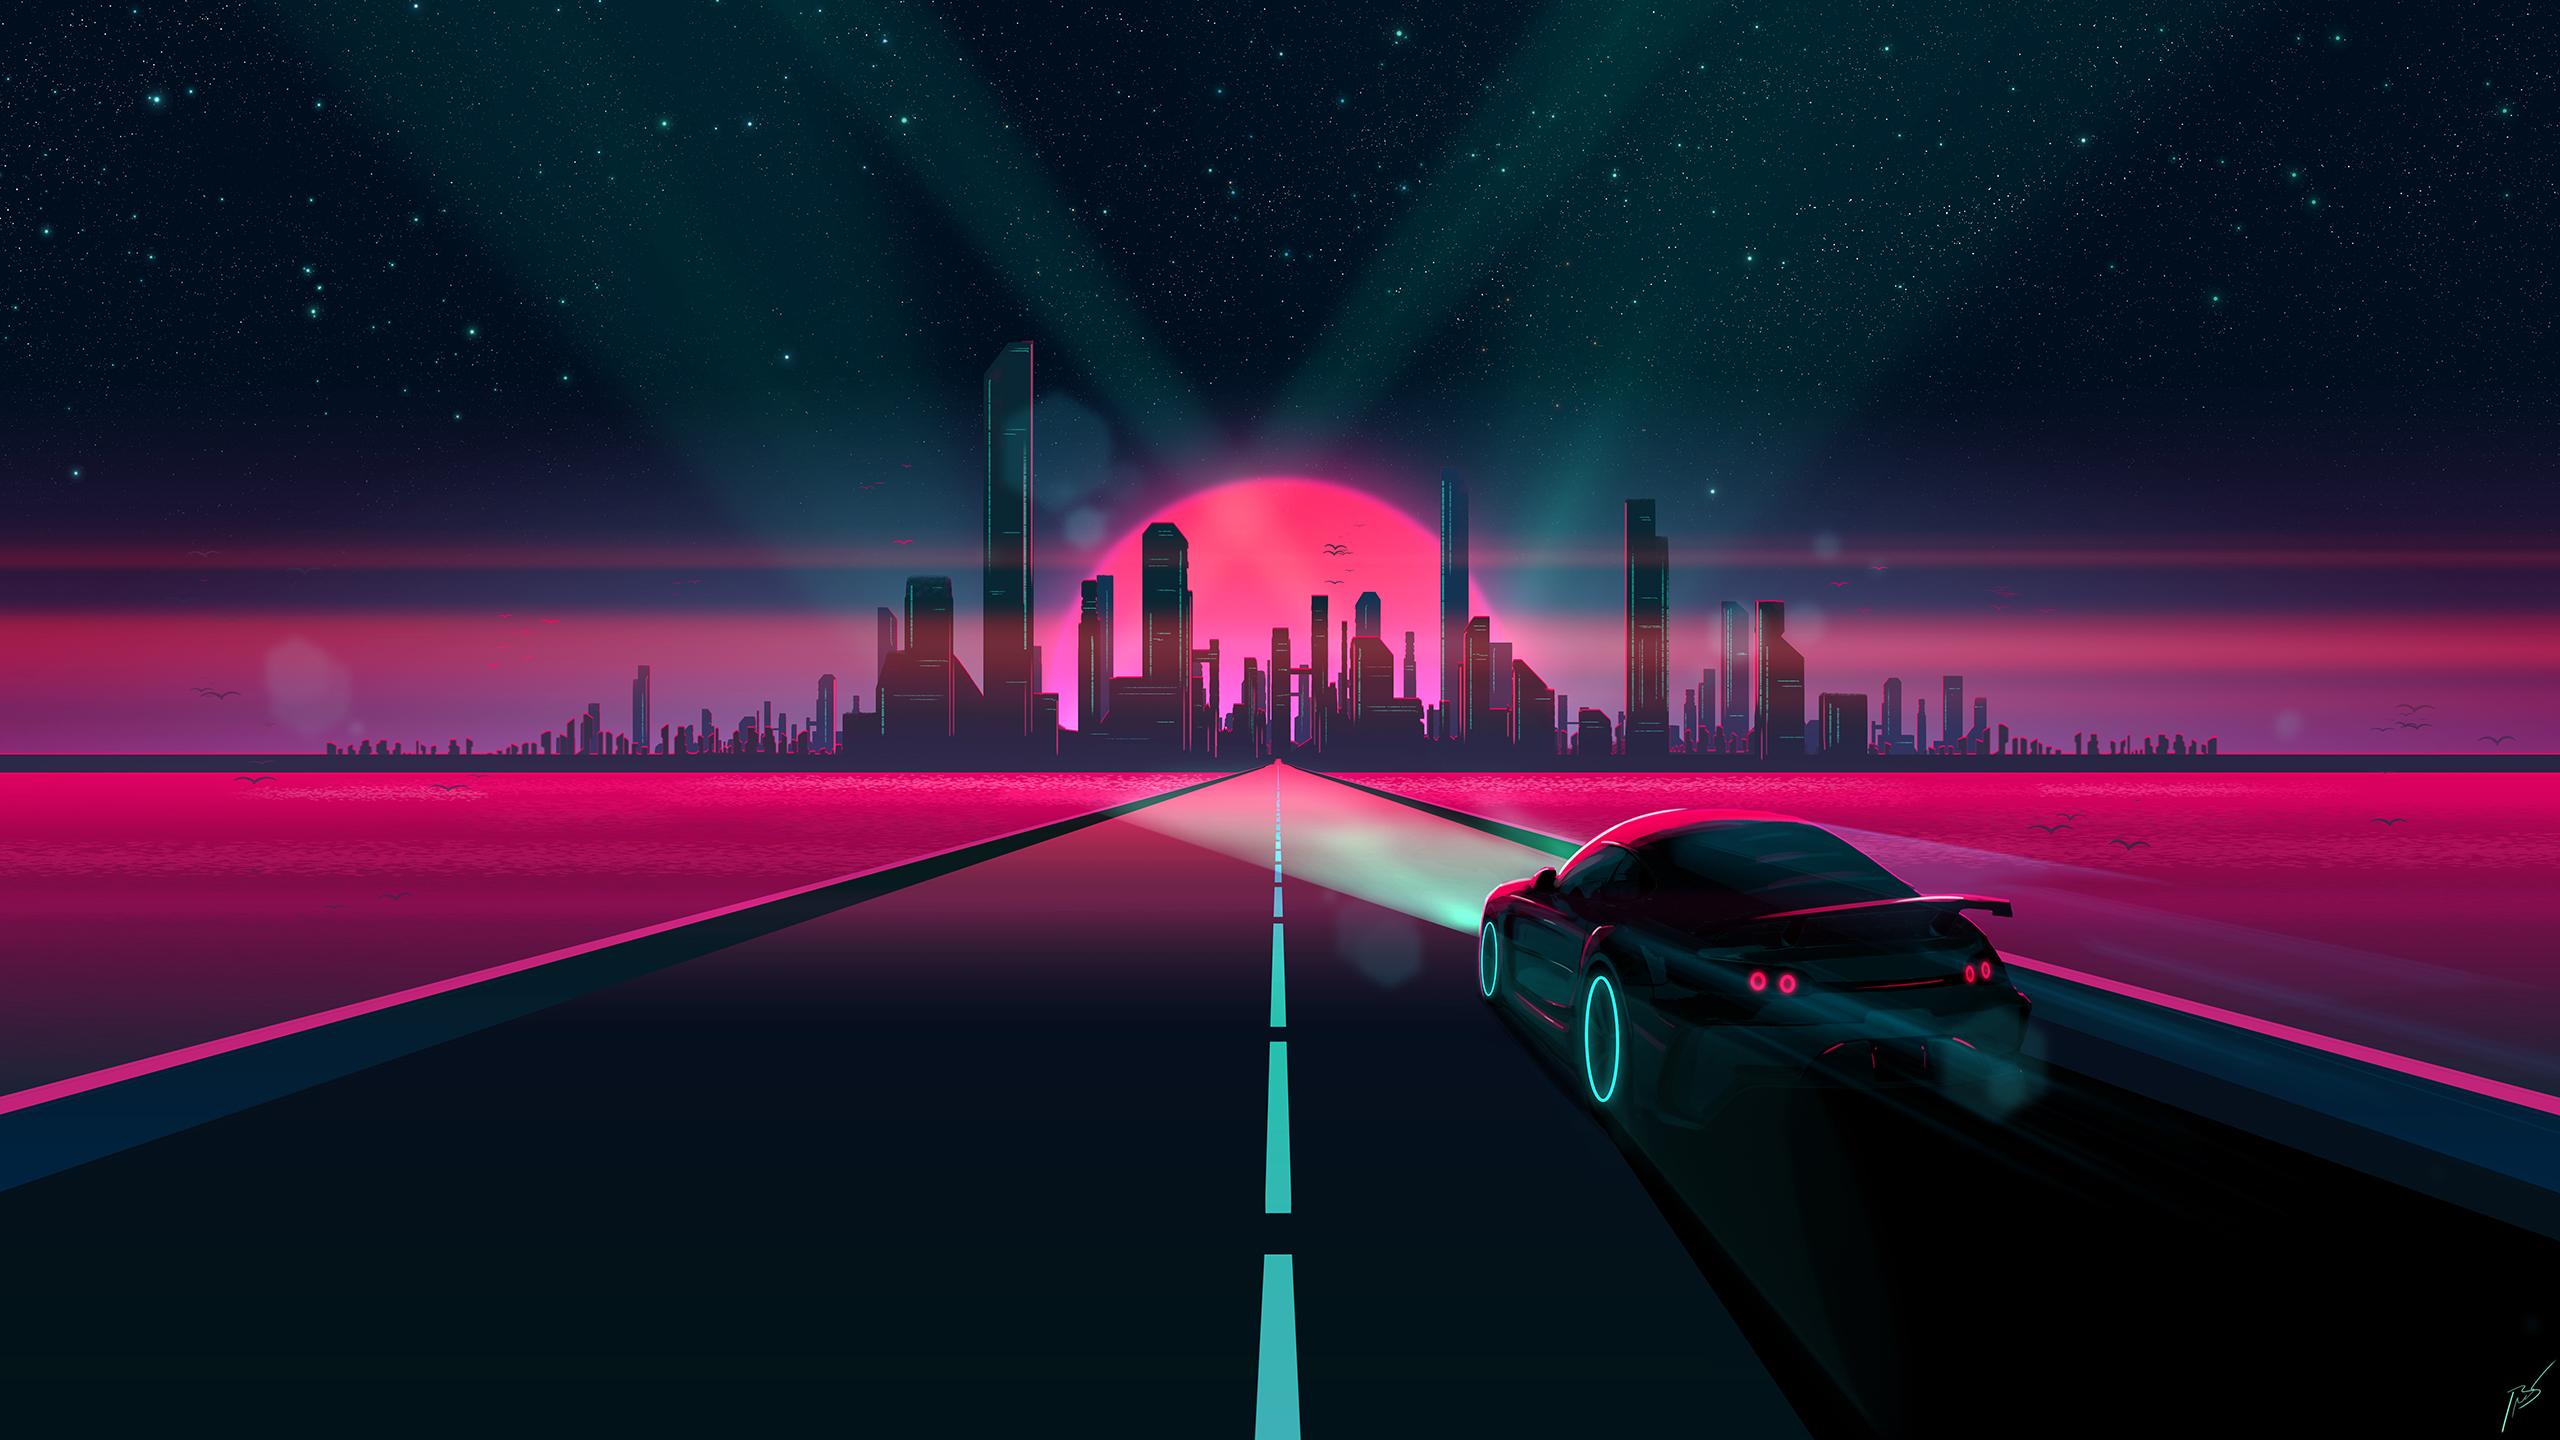 General 2560x1440 Retro style 1980s synthwave futuristic science fiction digital art JoeyJazz pastel